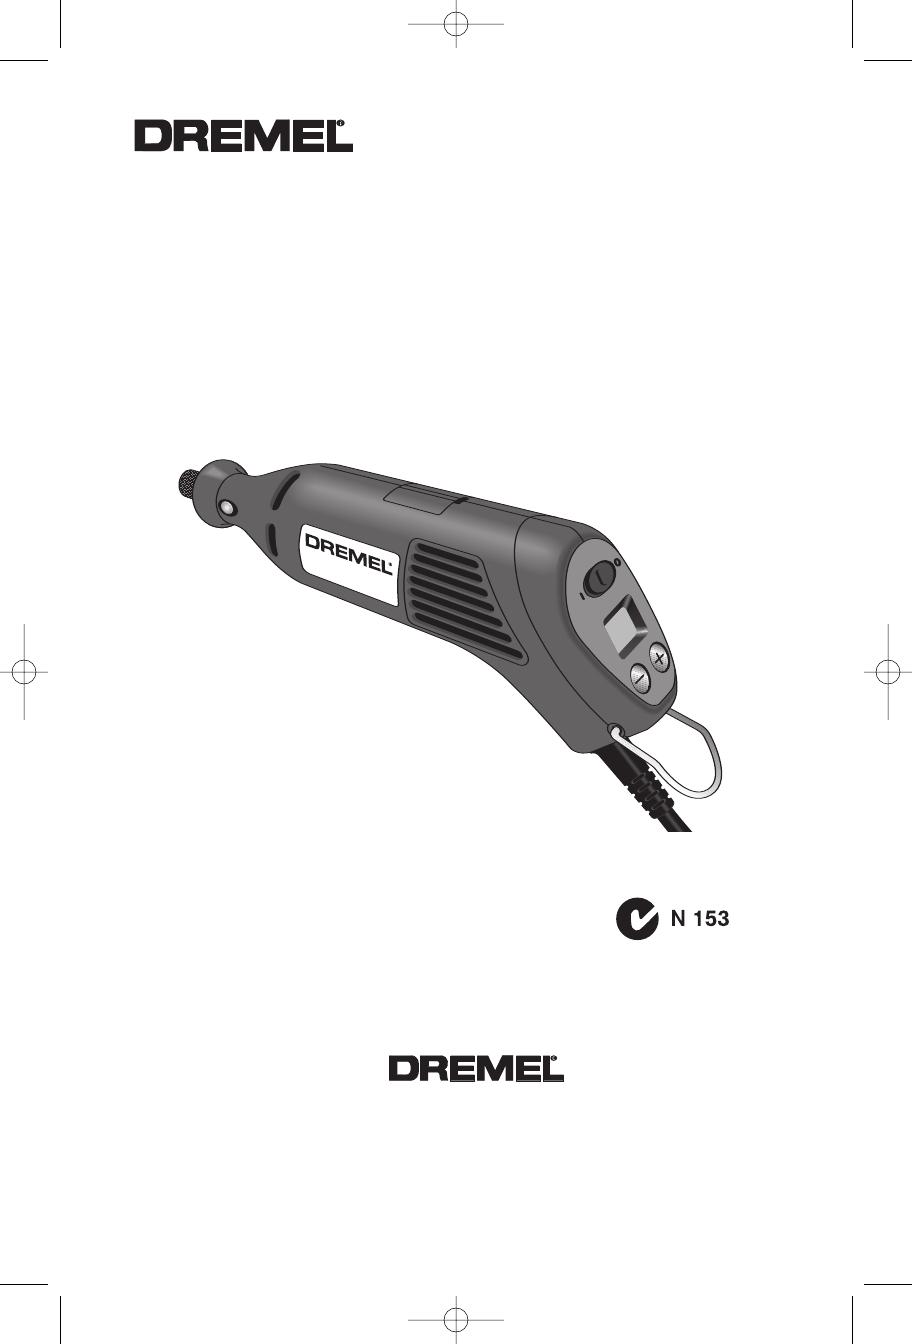 Dremel 400 Series Digital 398 49 Users Manual DM 2610934164 04 06 on